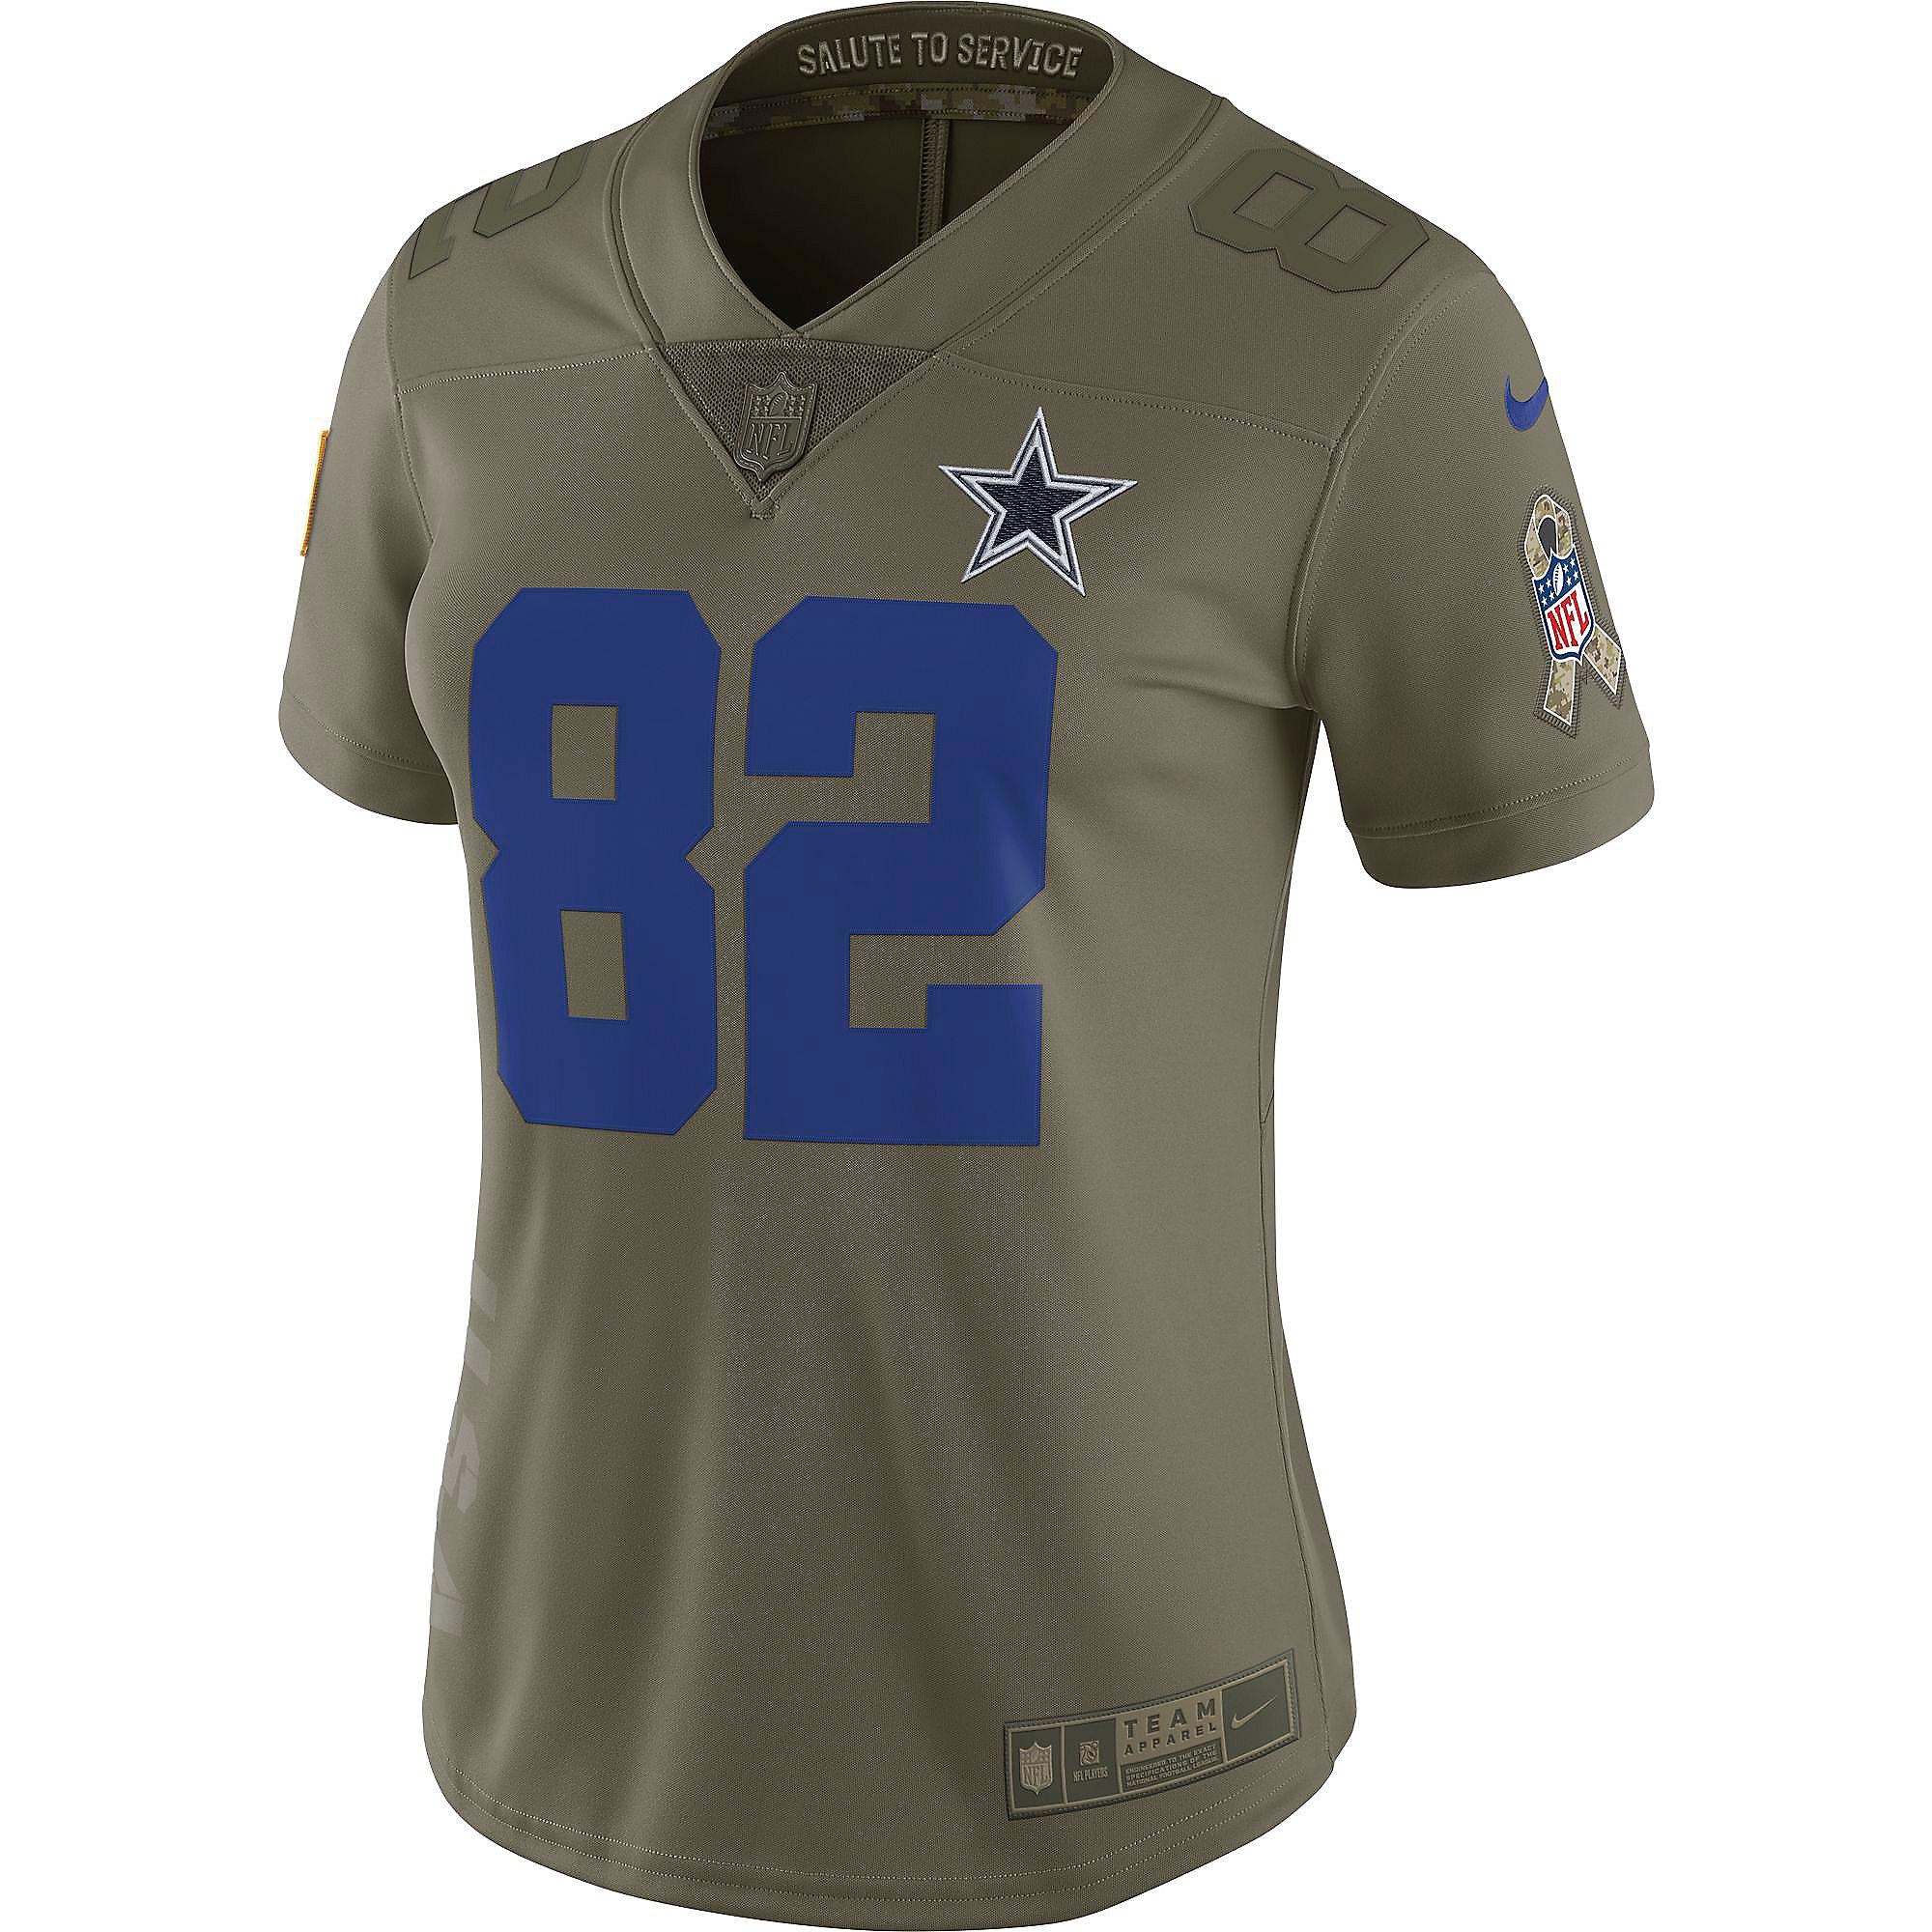 buy online 760c1 4333b Dallas Cowboys Womens Jason Witten #82 Nike Limited Salute To Service  Jersey | Dallas Cowboys Pro Shop